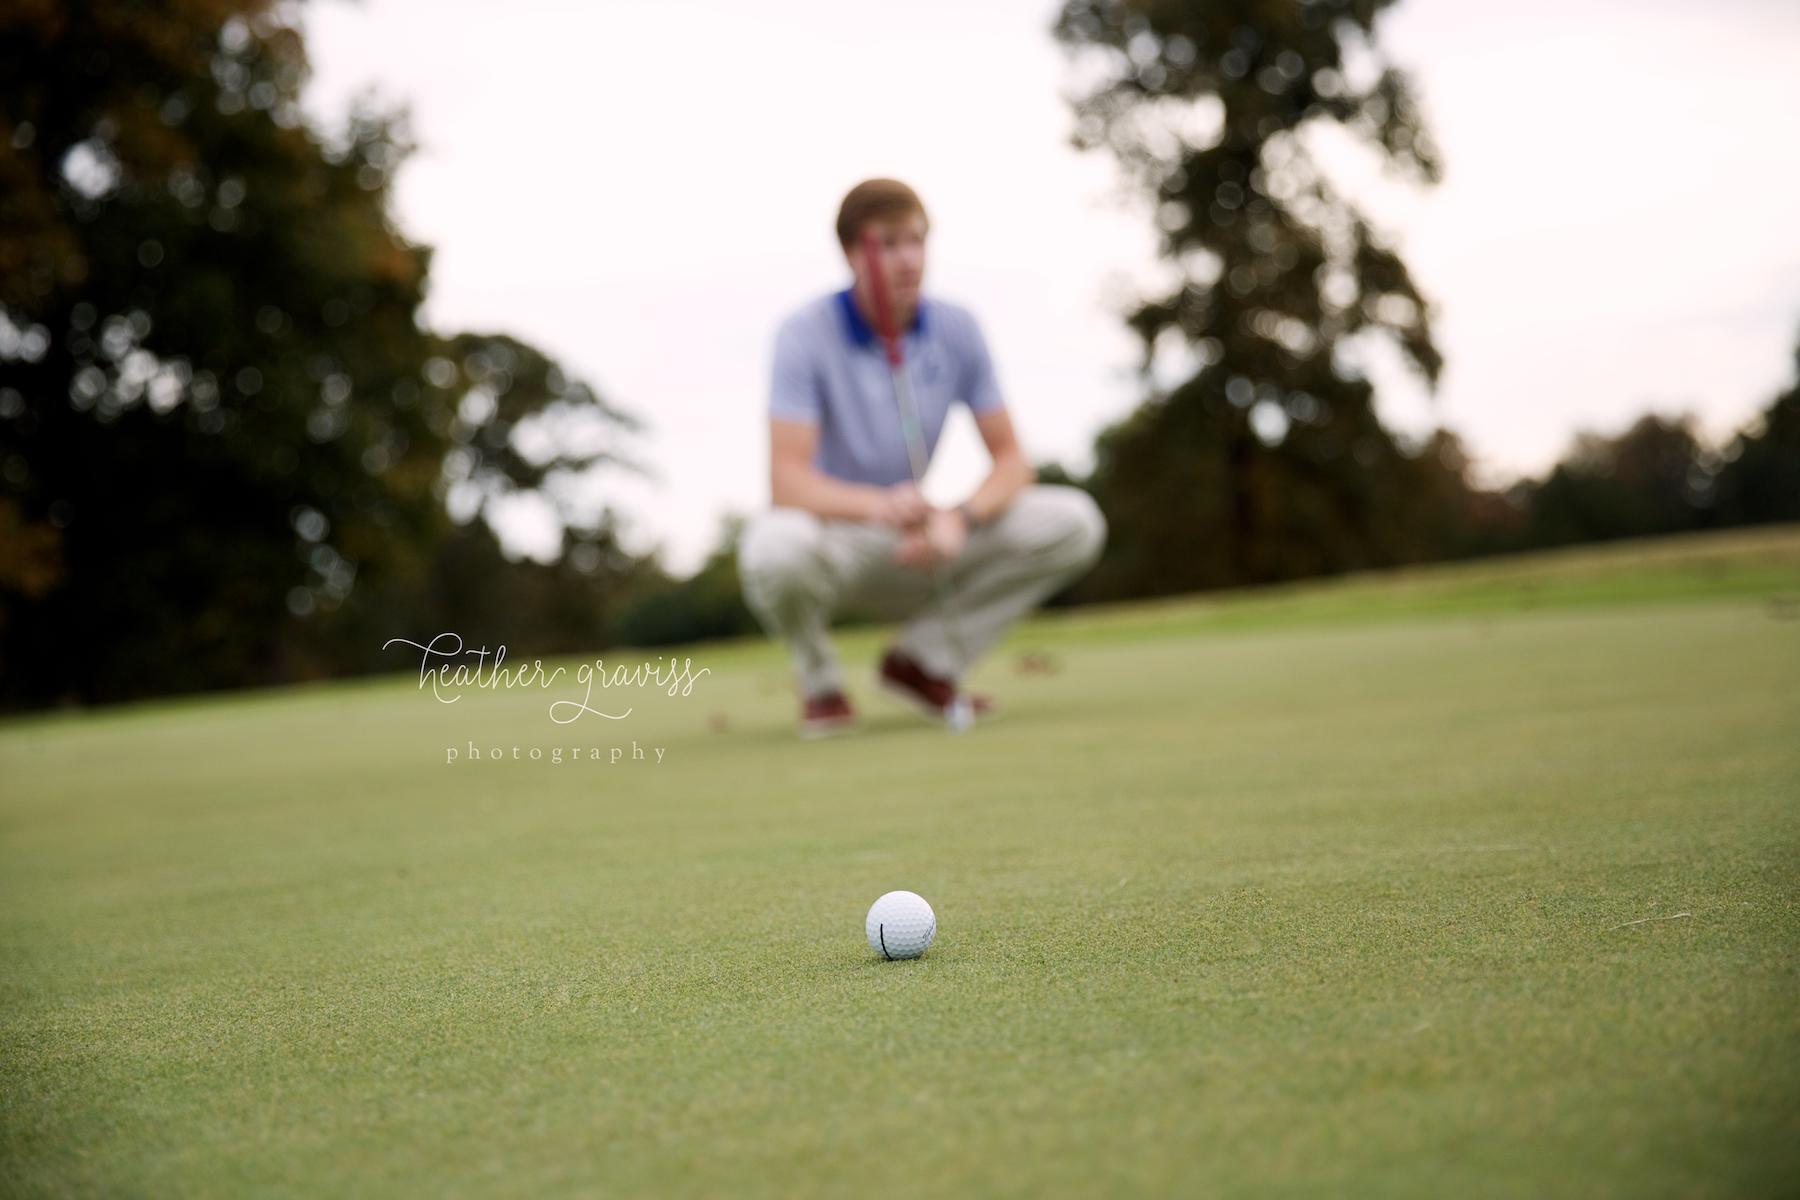 golf-ball-rolling.jpg